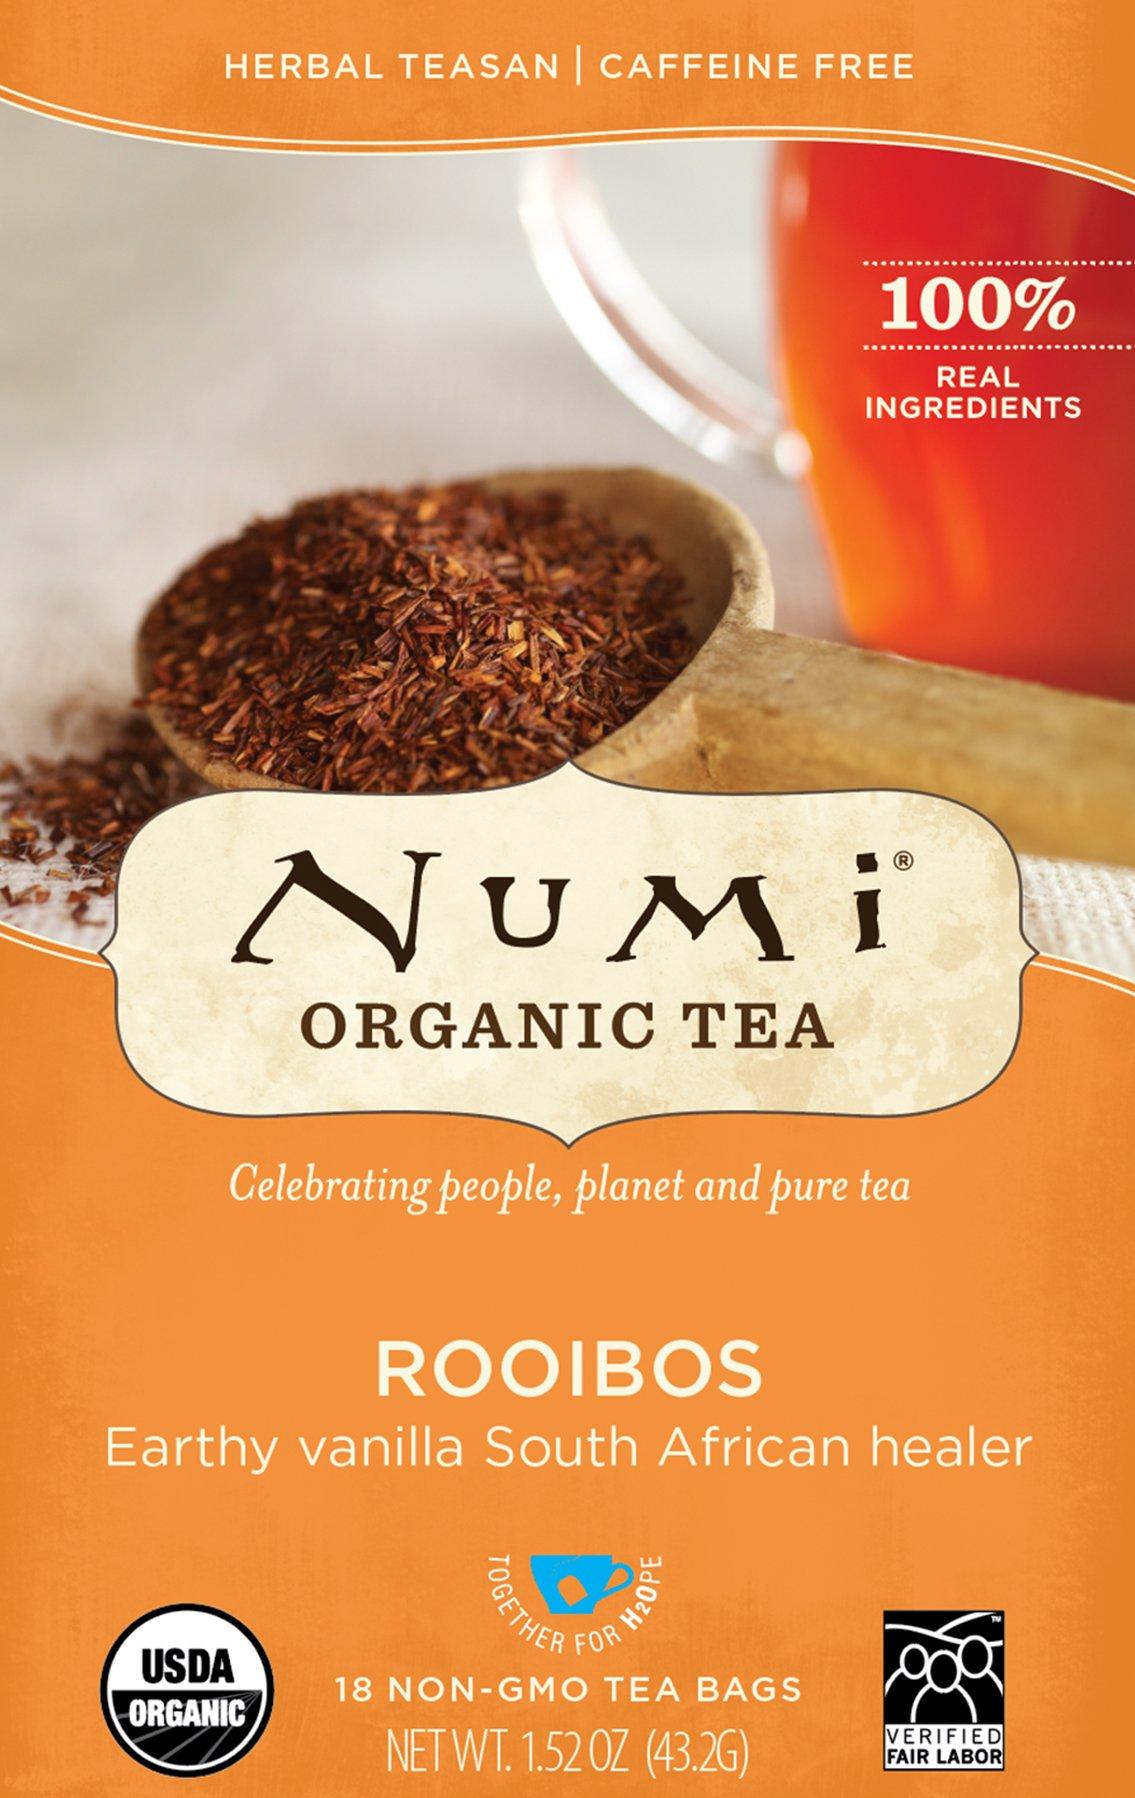 Numi Organic Tea Rooibos, 18 Count Box of Tea Bags (Pack of 6), Herbal Teasan